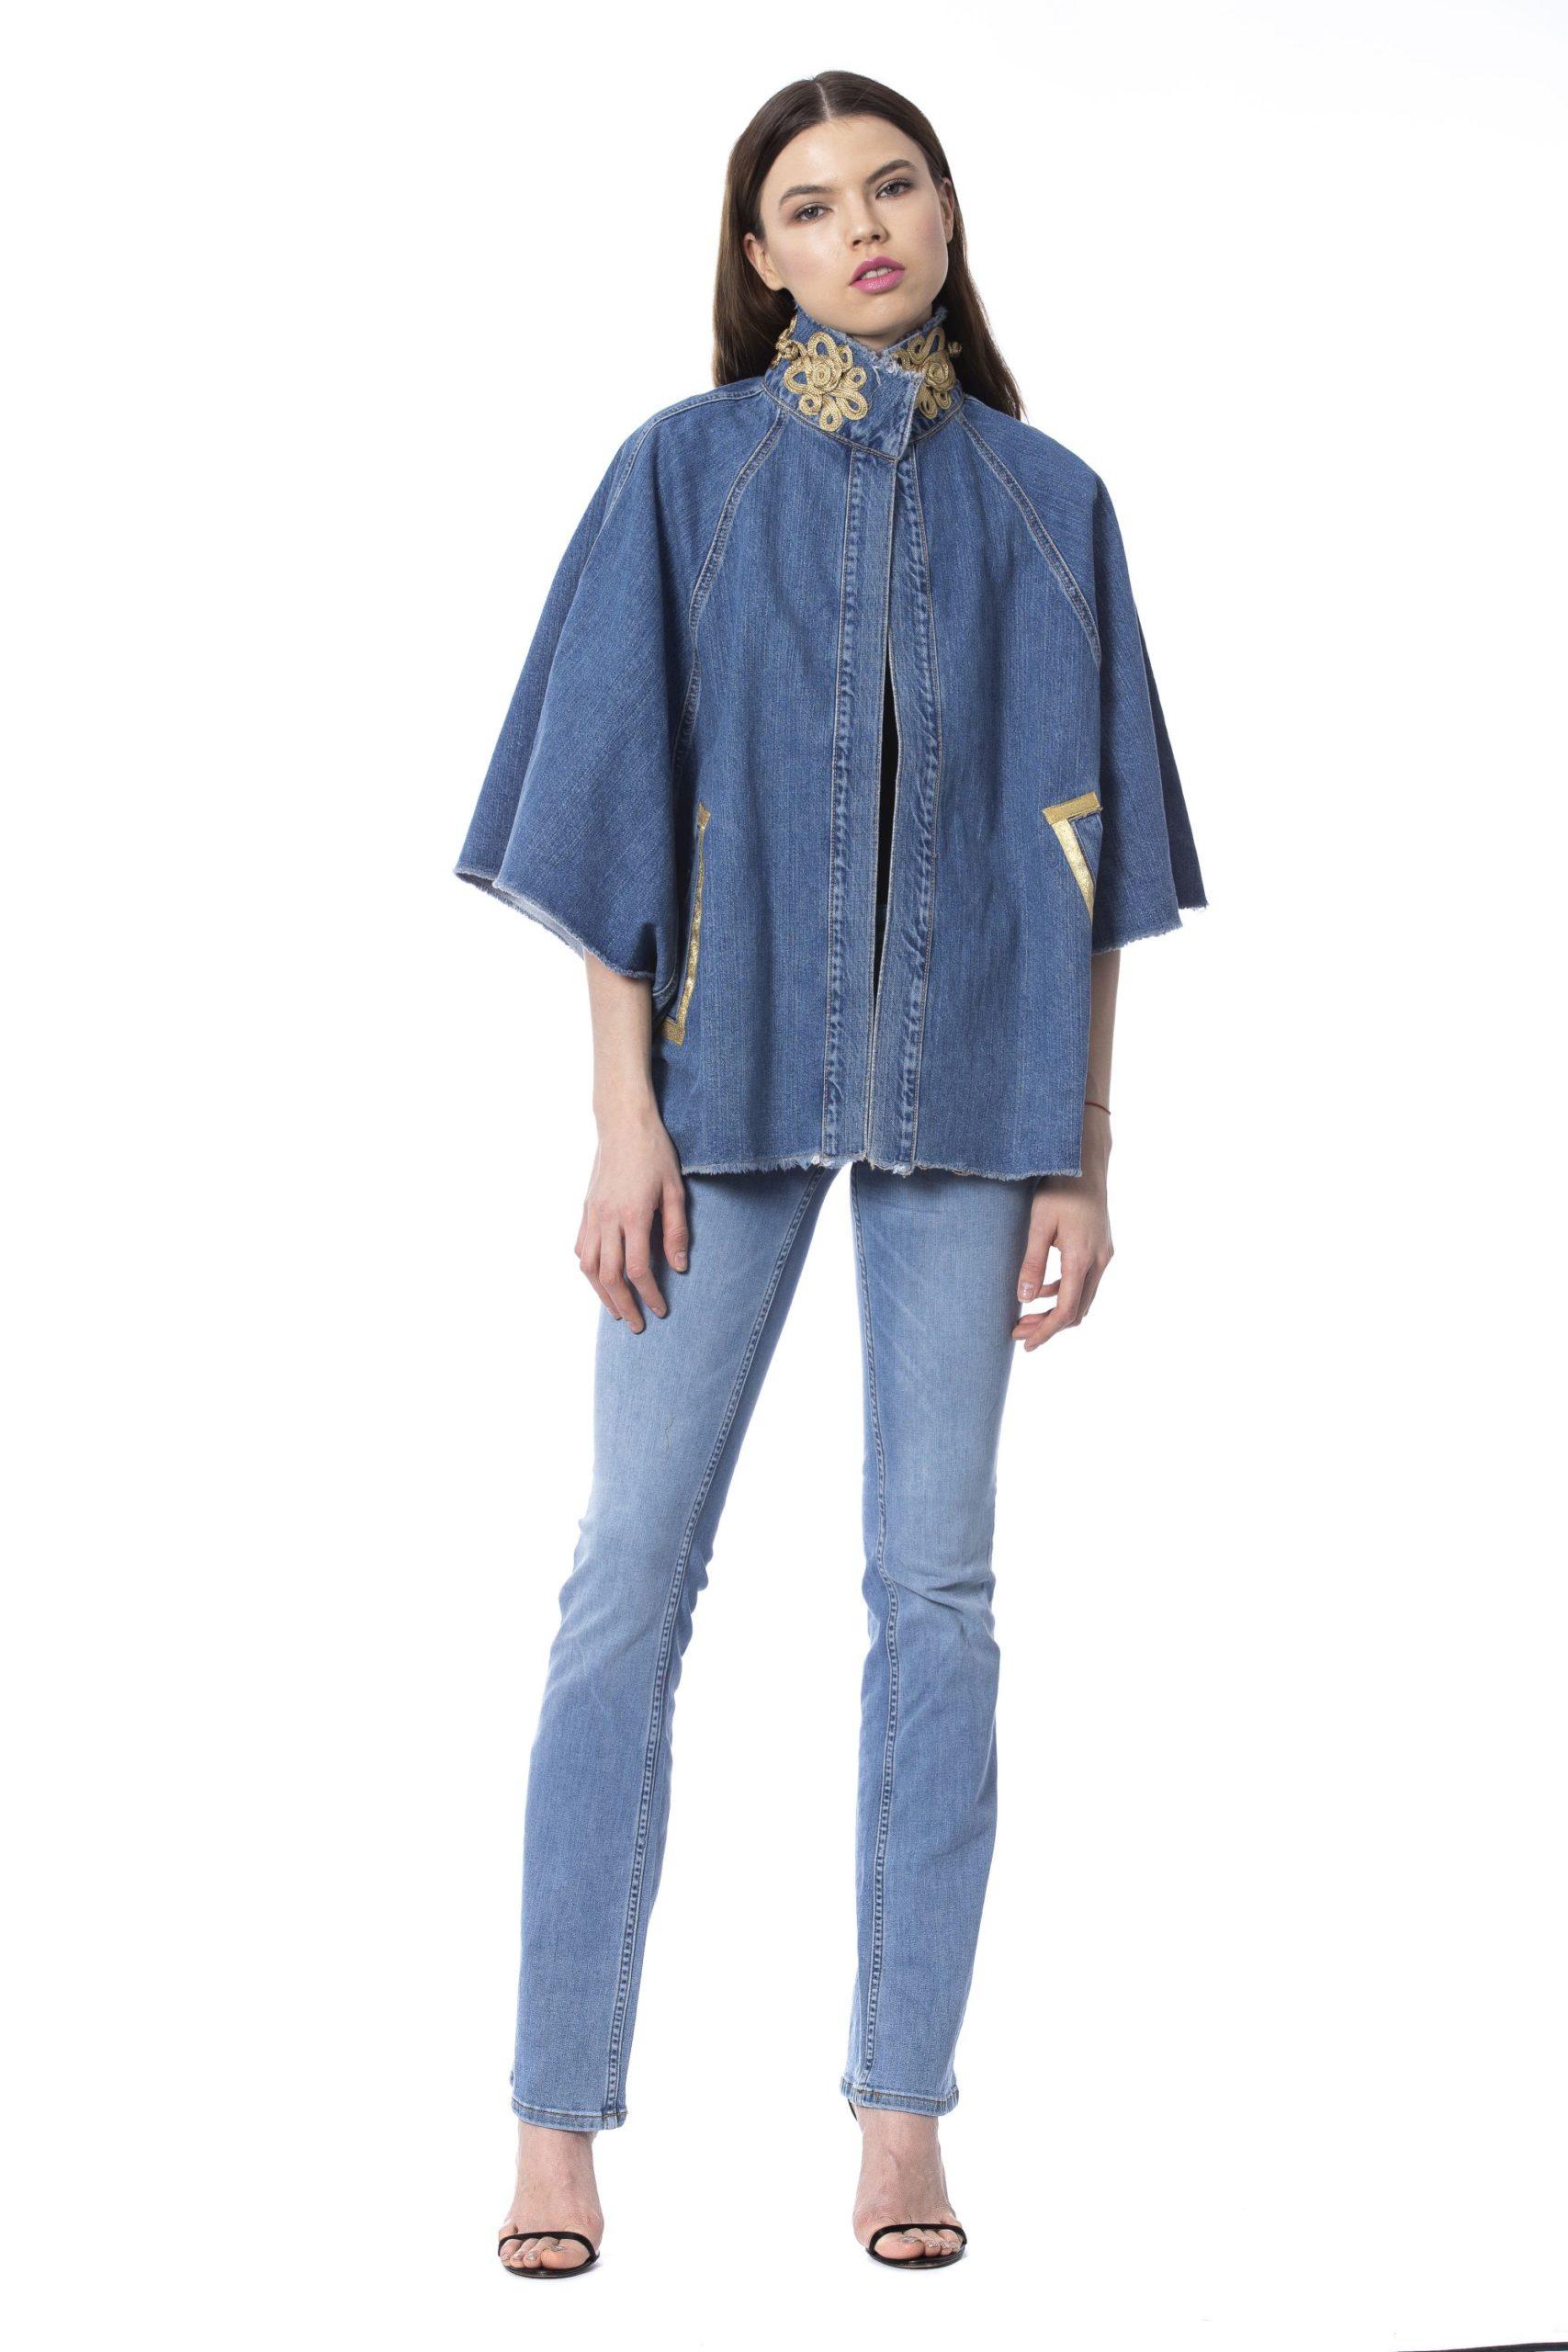 Jeansmedium Jackets & Coat - XS